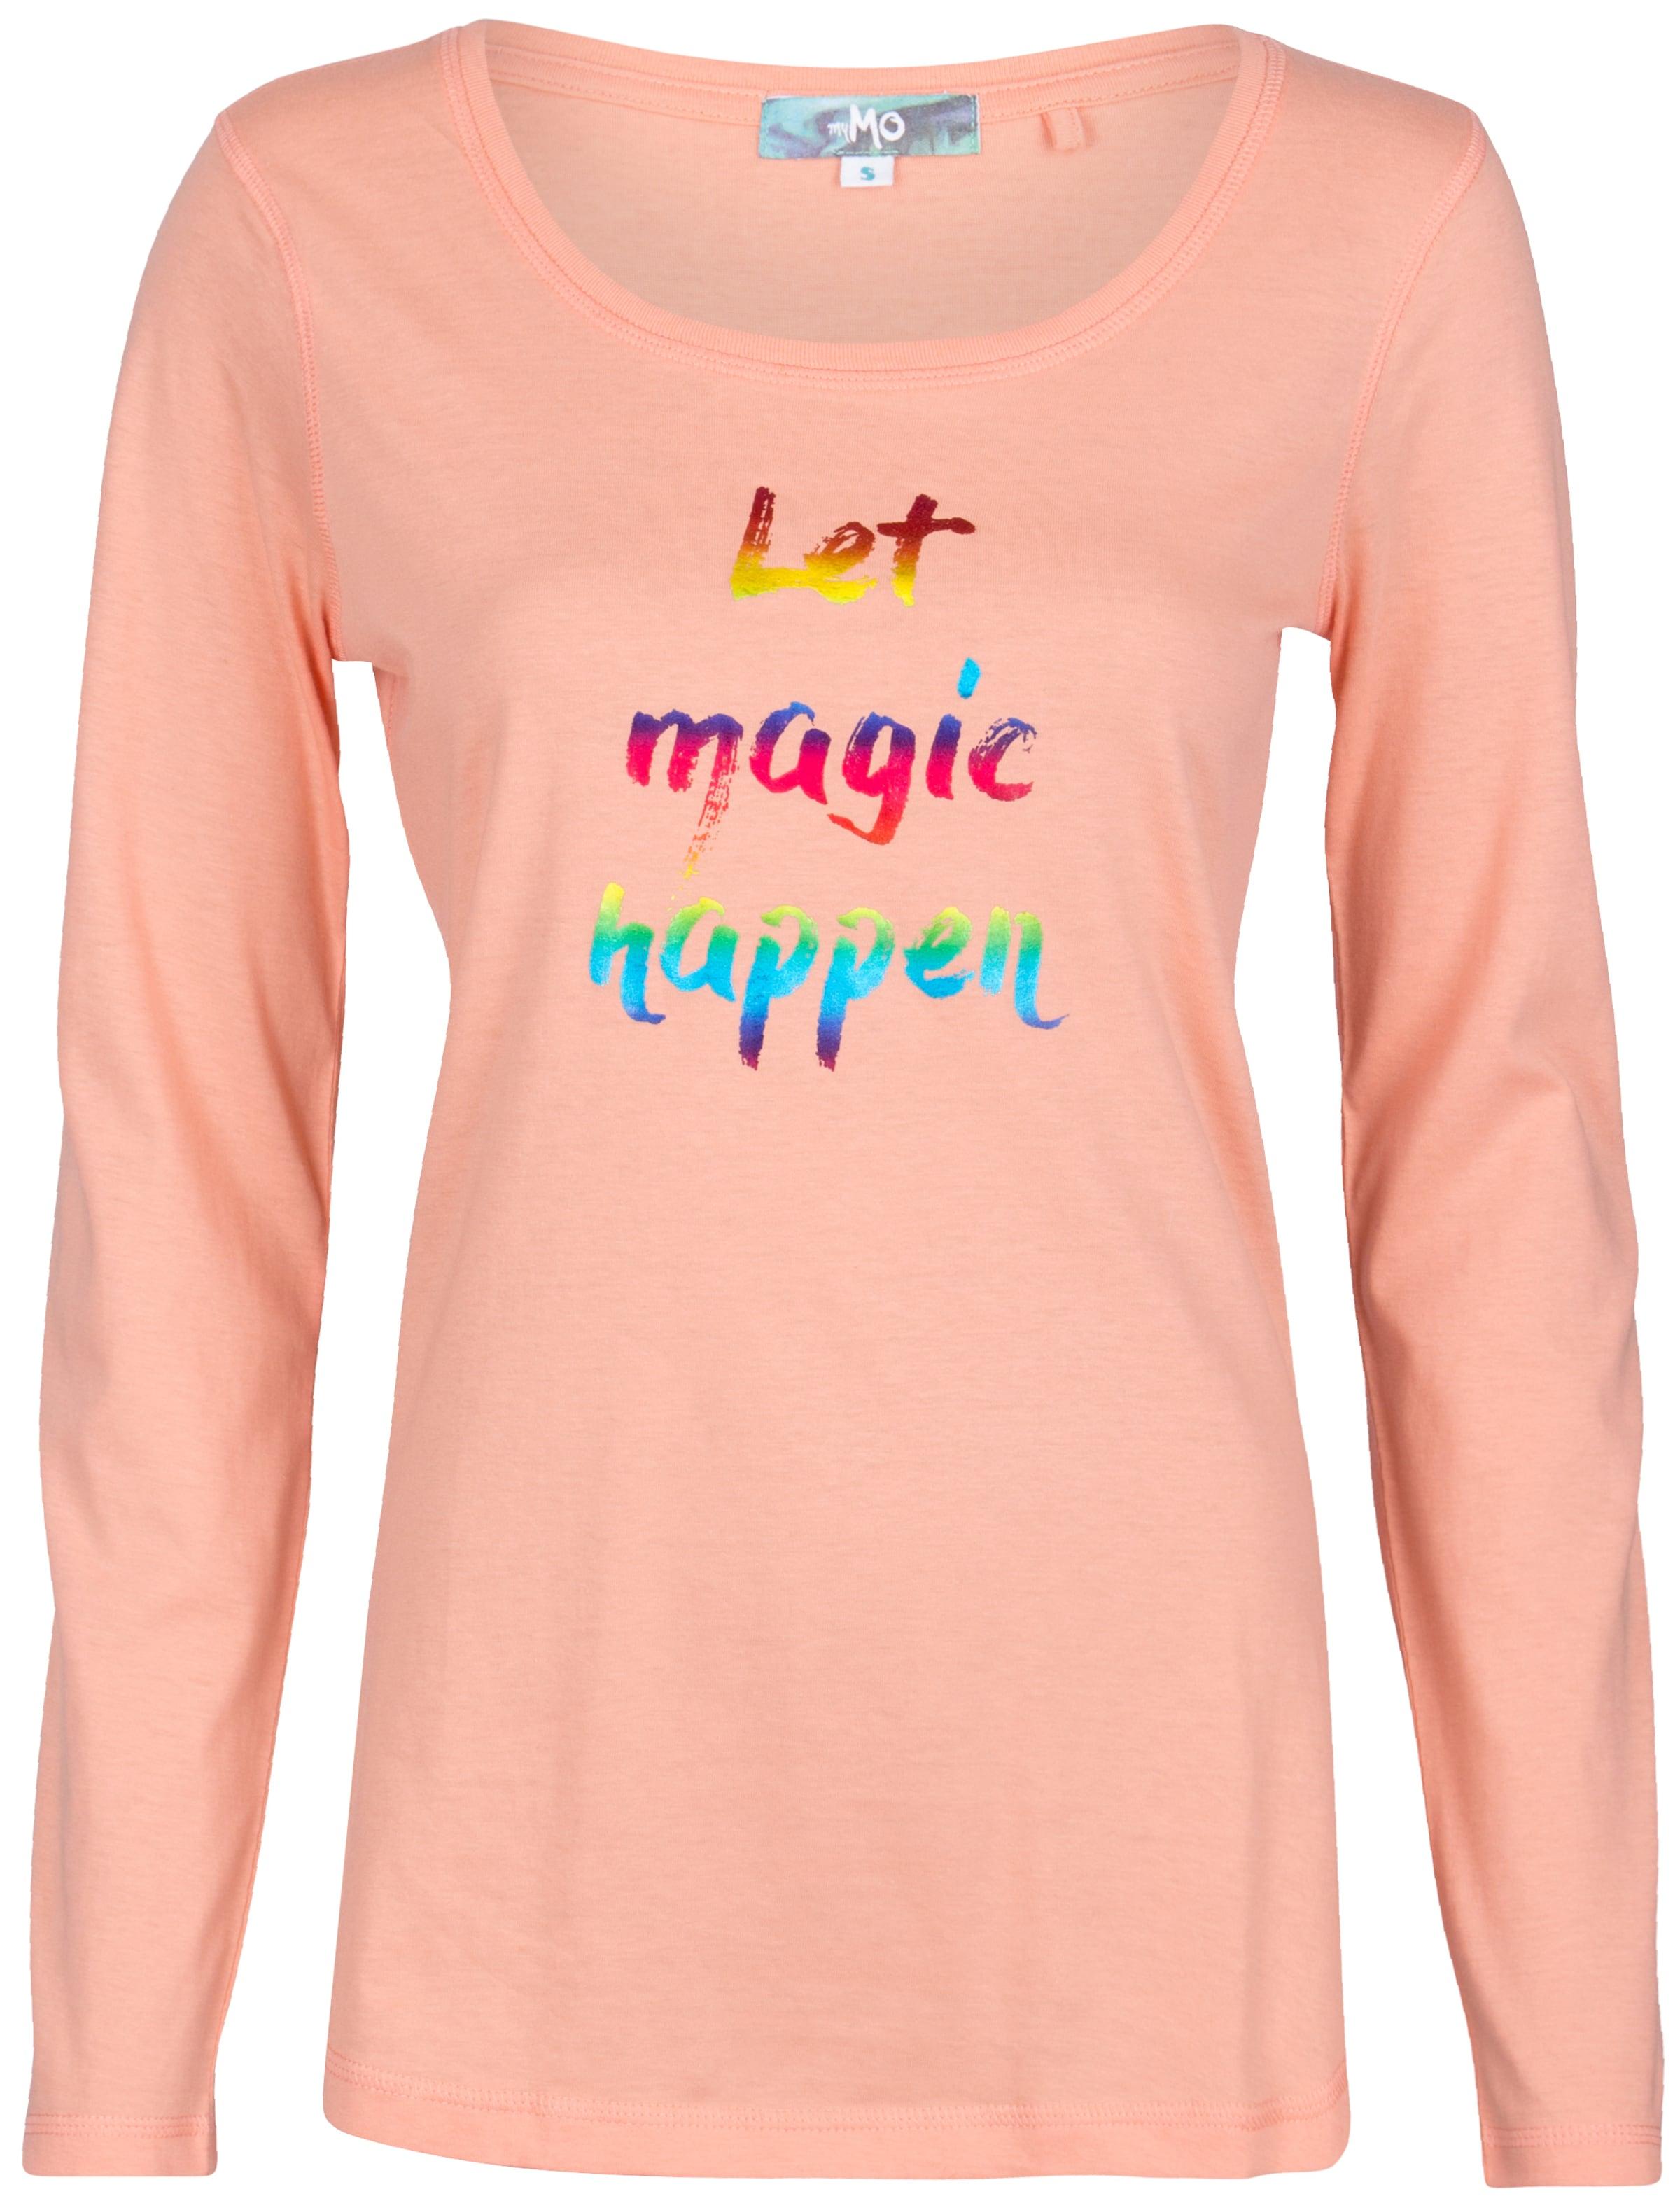 shirt Mymo T En T Mymo T shirt En En OrangeAbricot shirt Mymo OrangeAbricot TlFJ31Kc